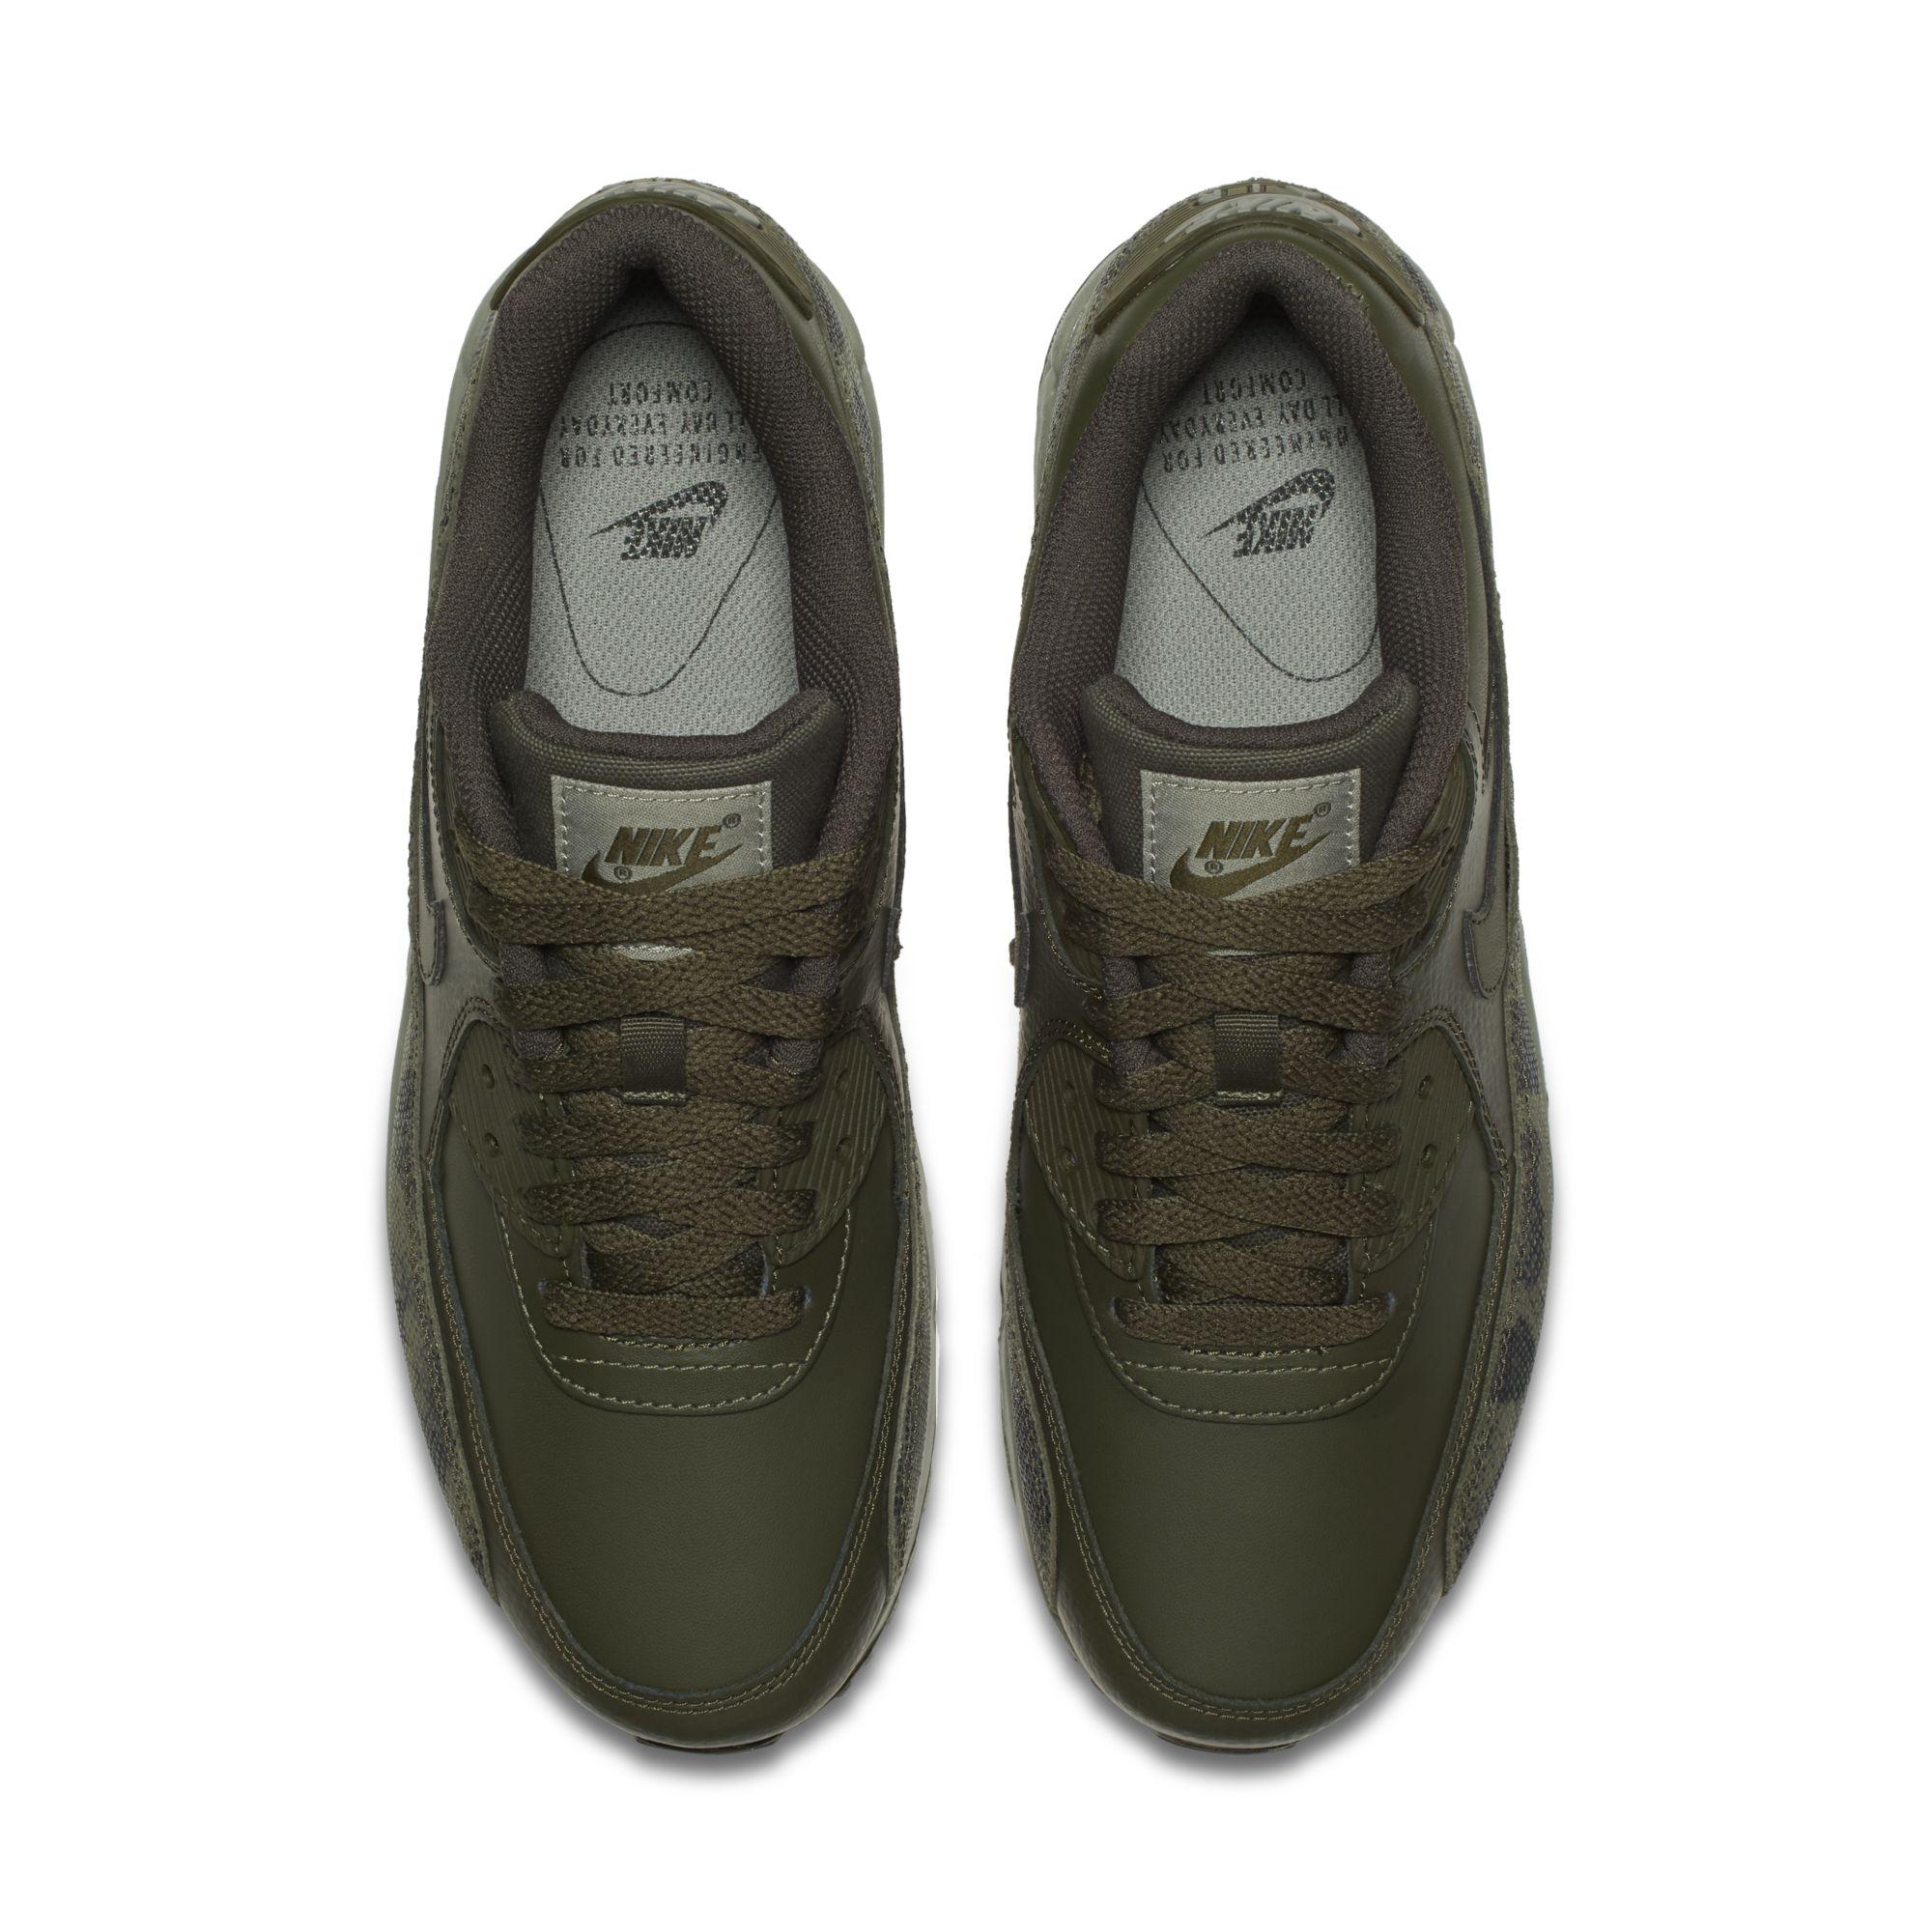 The Women's Nike Air Max 90 'Pinnacle Pack' Flaunts